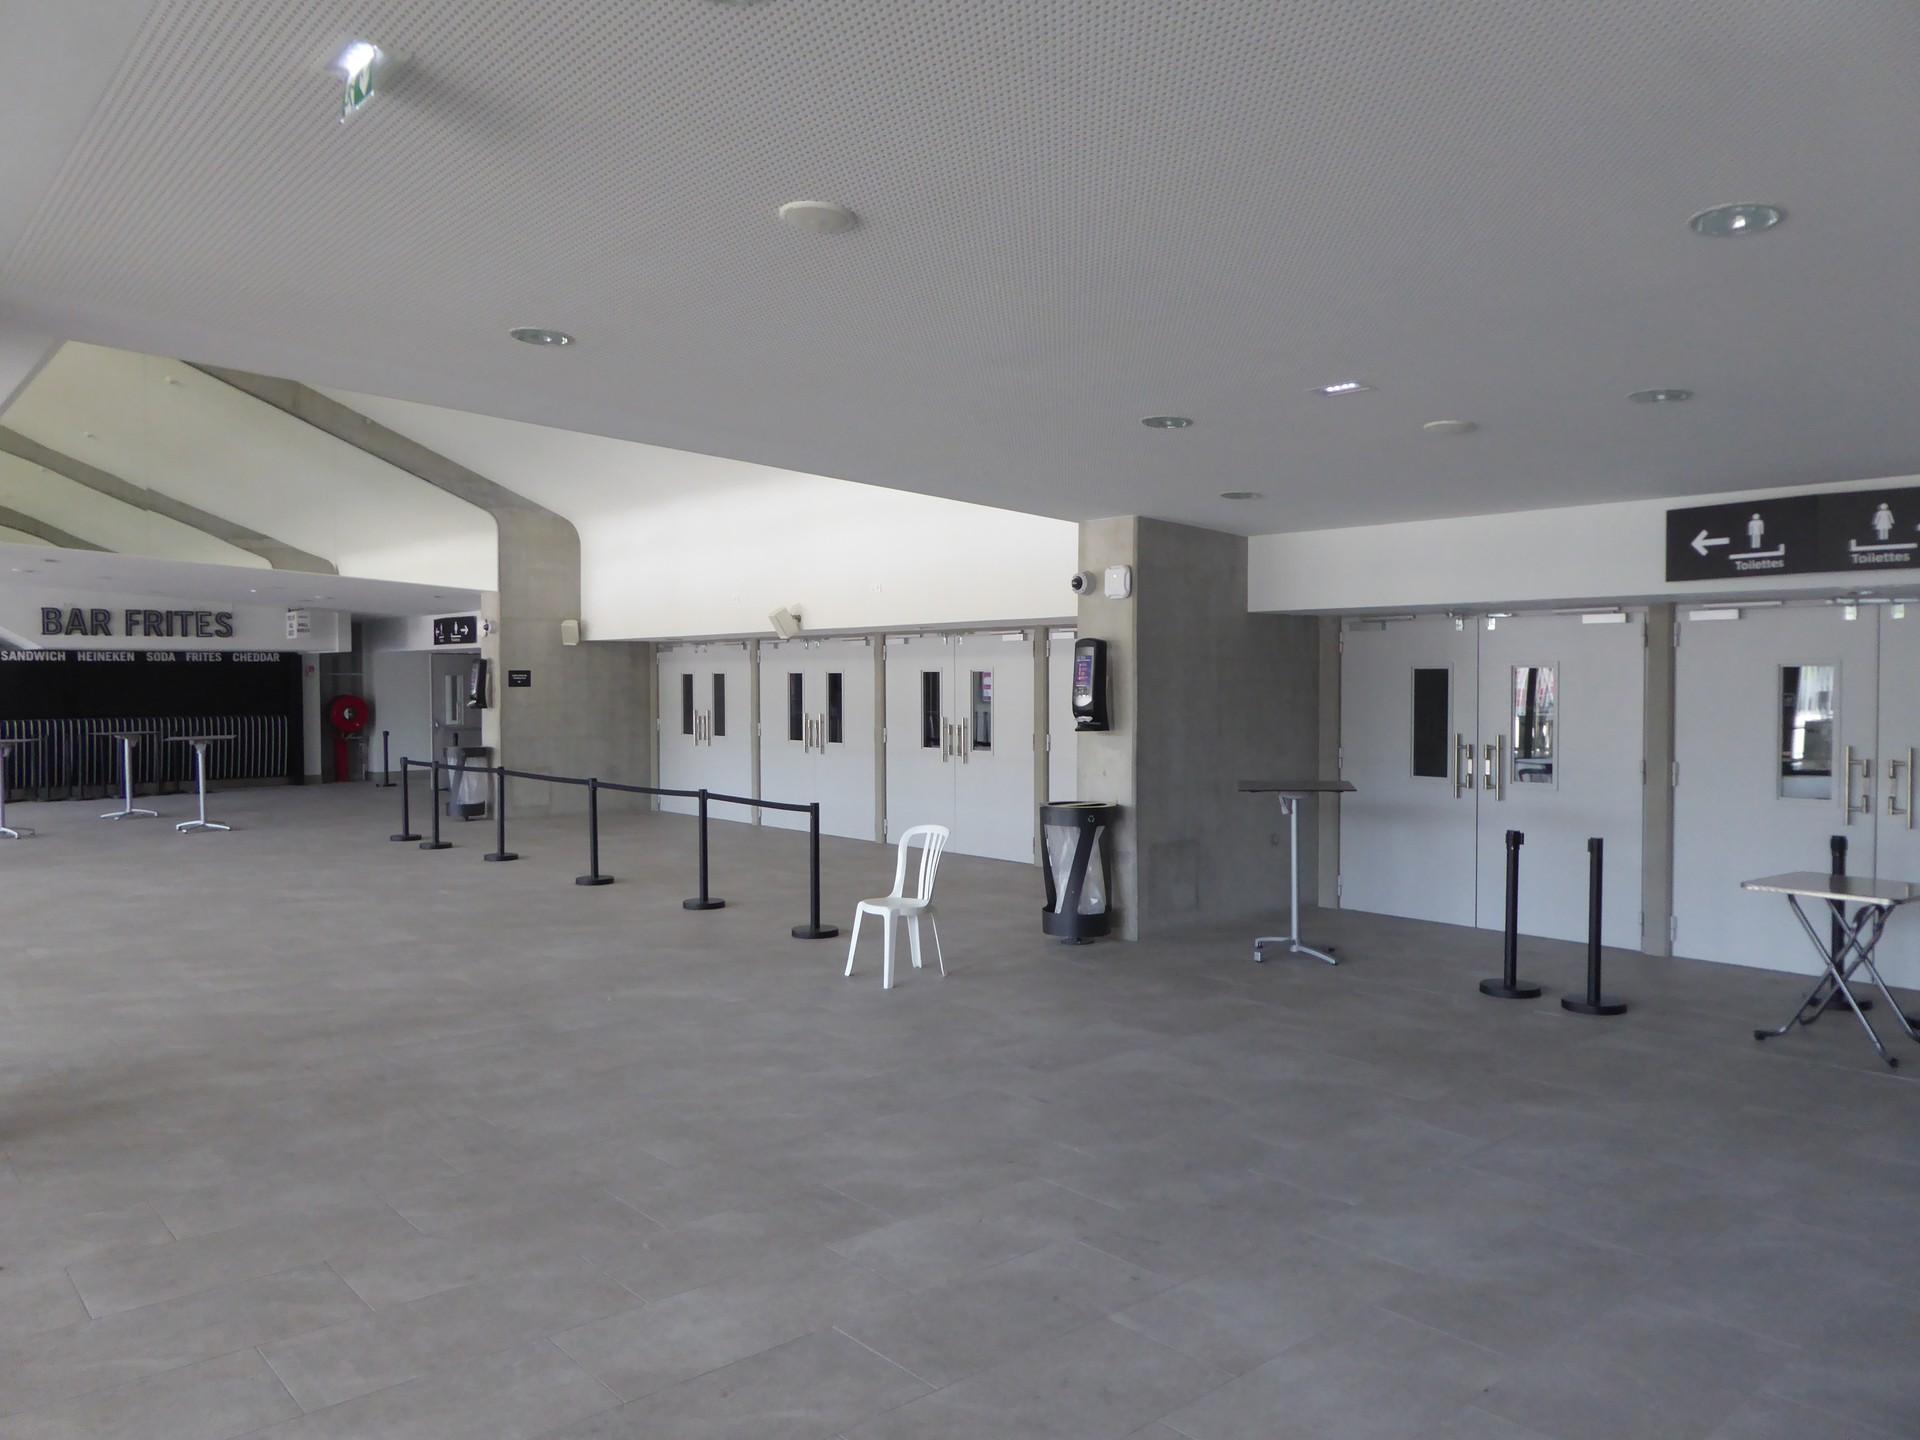 DOORTAL - U aréna porte phonique